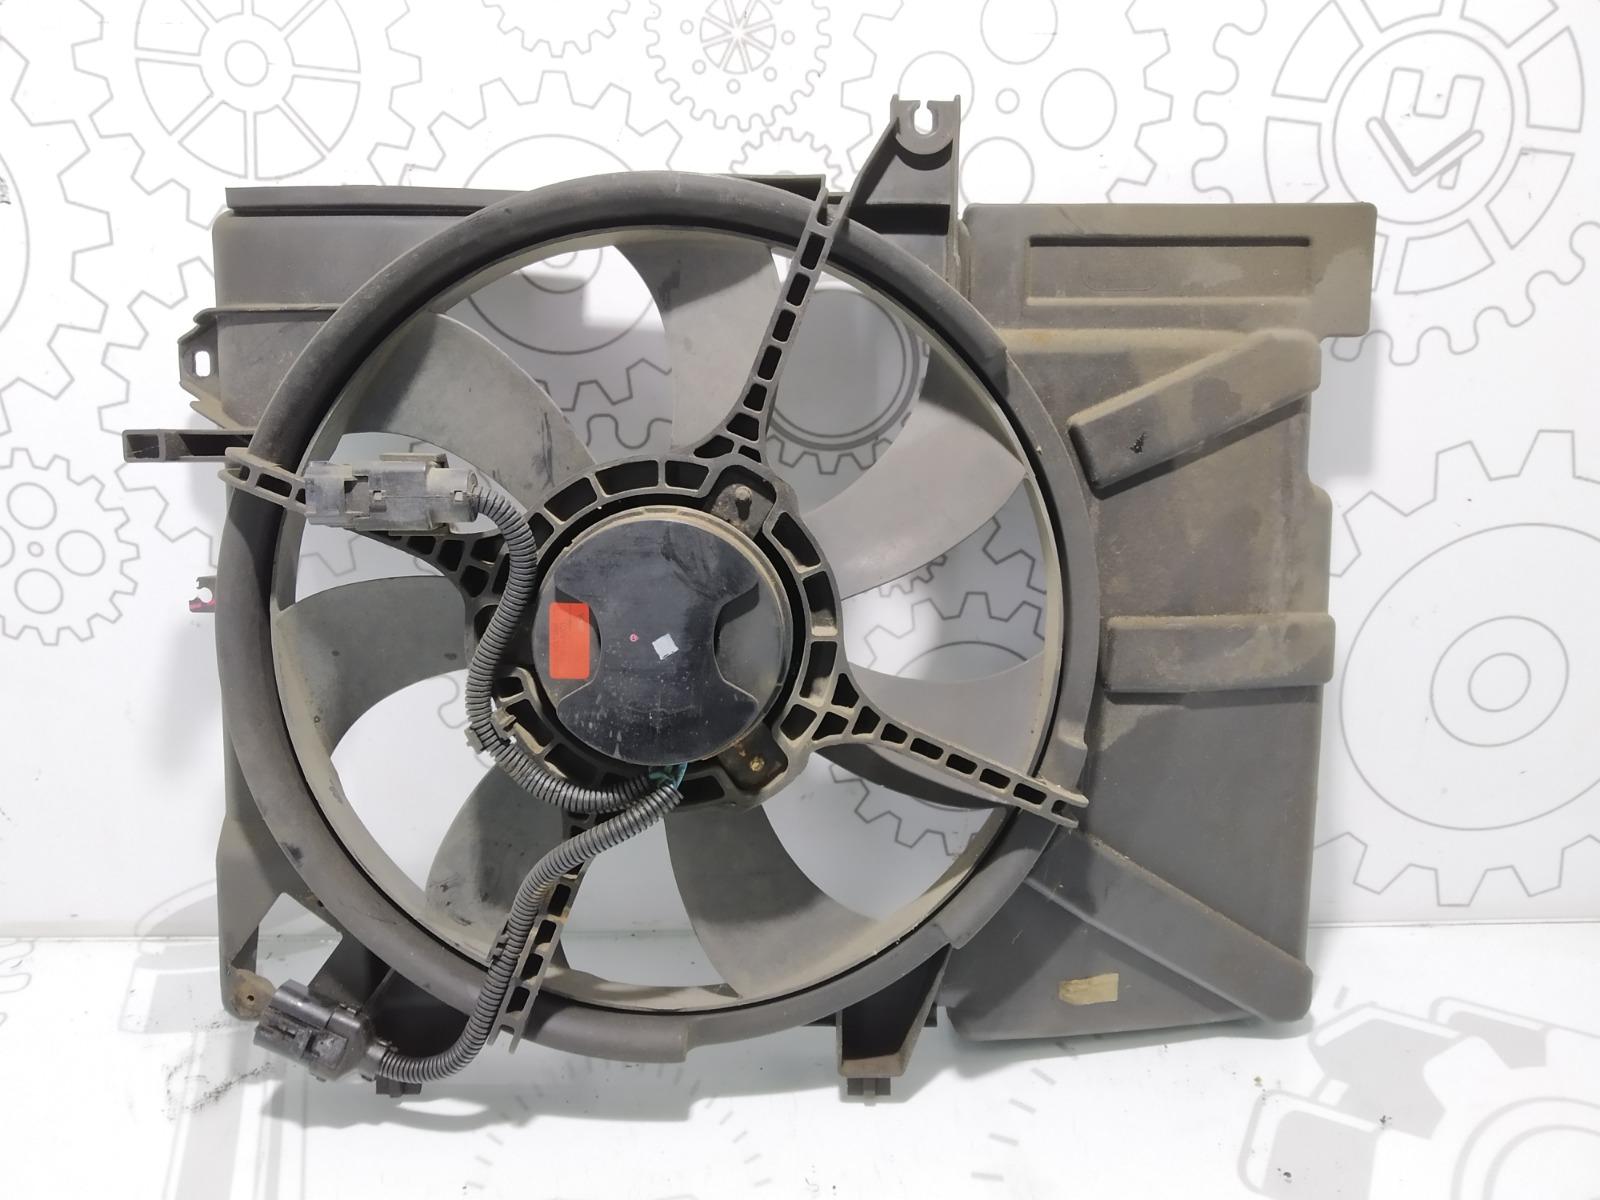 Вентилятор радиатора Hyundai Getz 1.3 I 2004 (б/у)